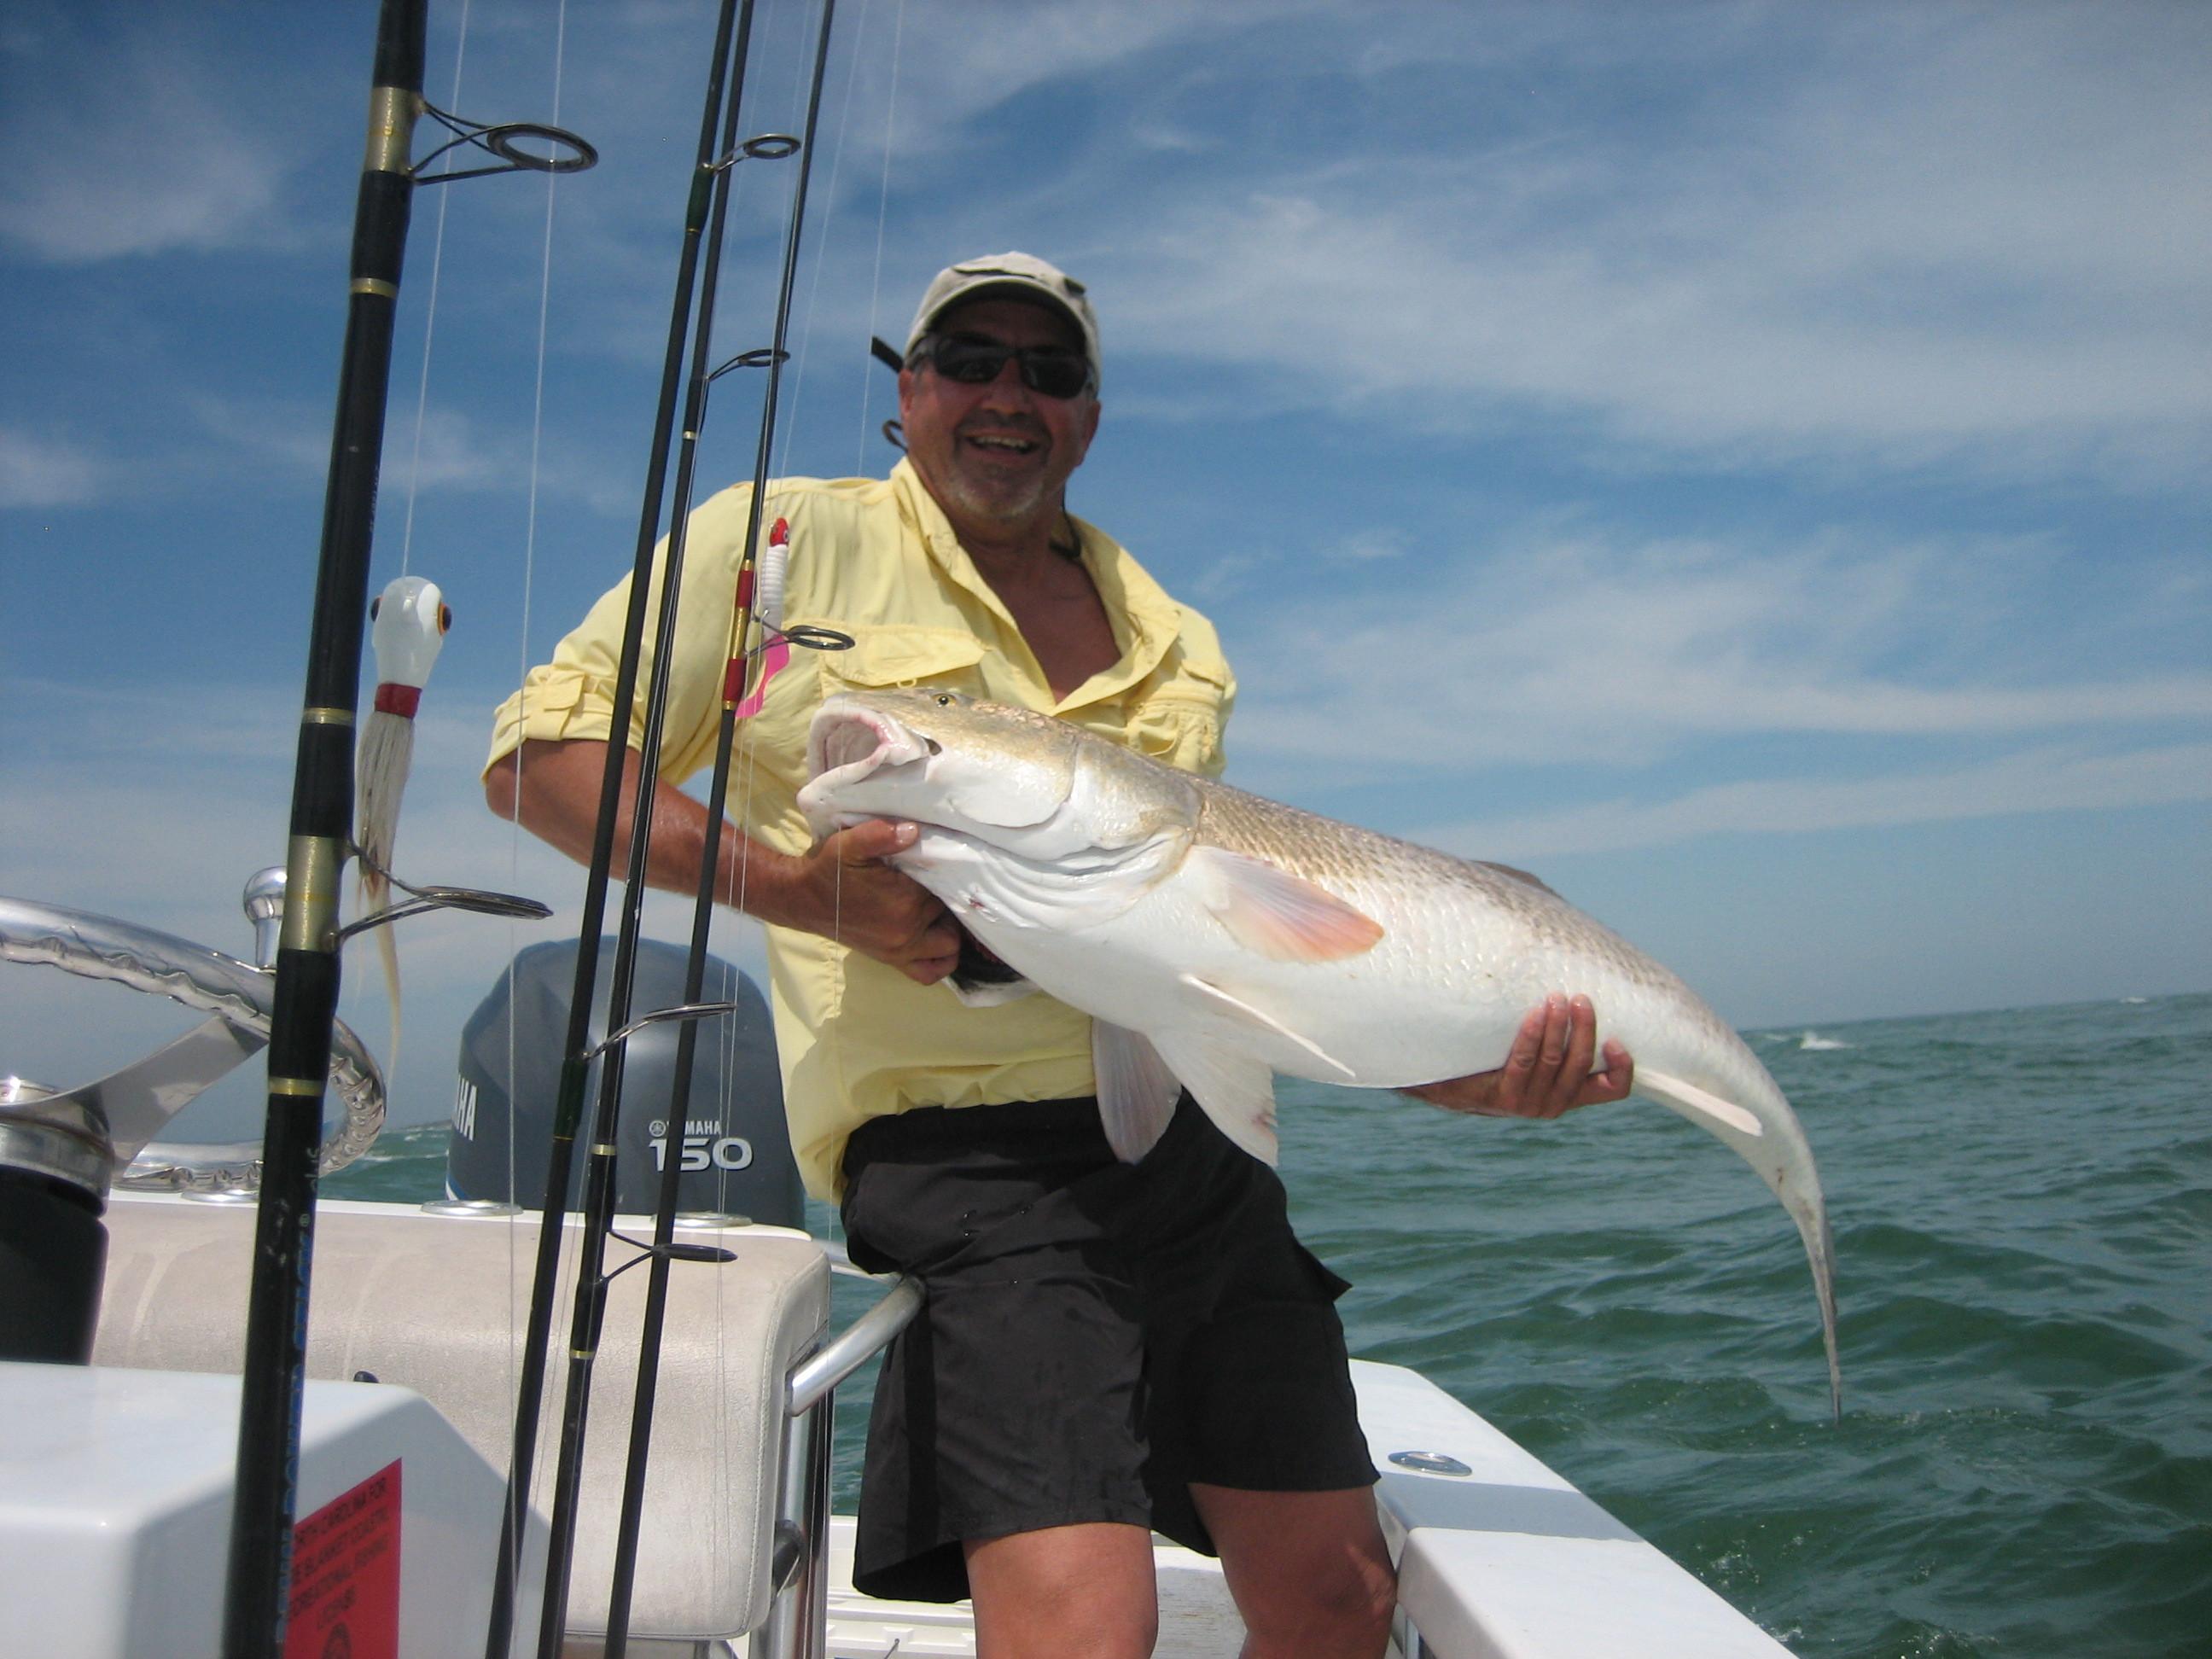 Ken Dempsey Guide Service: Fishing